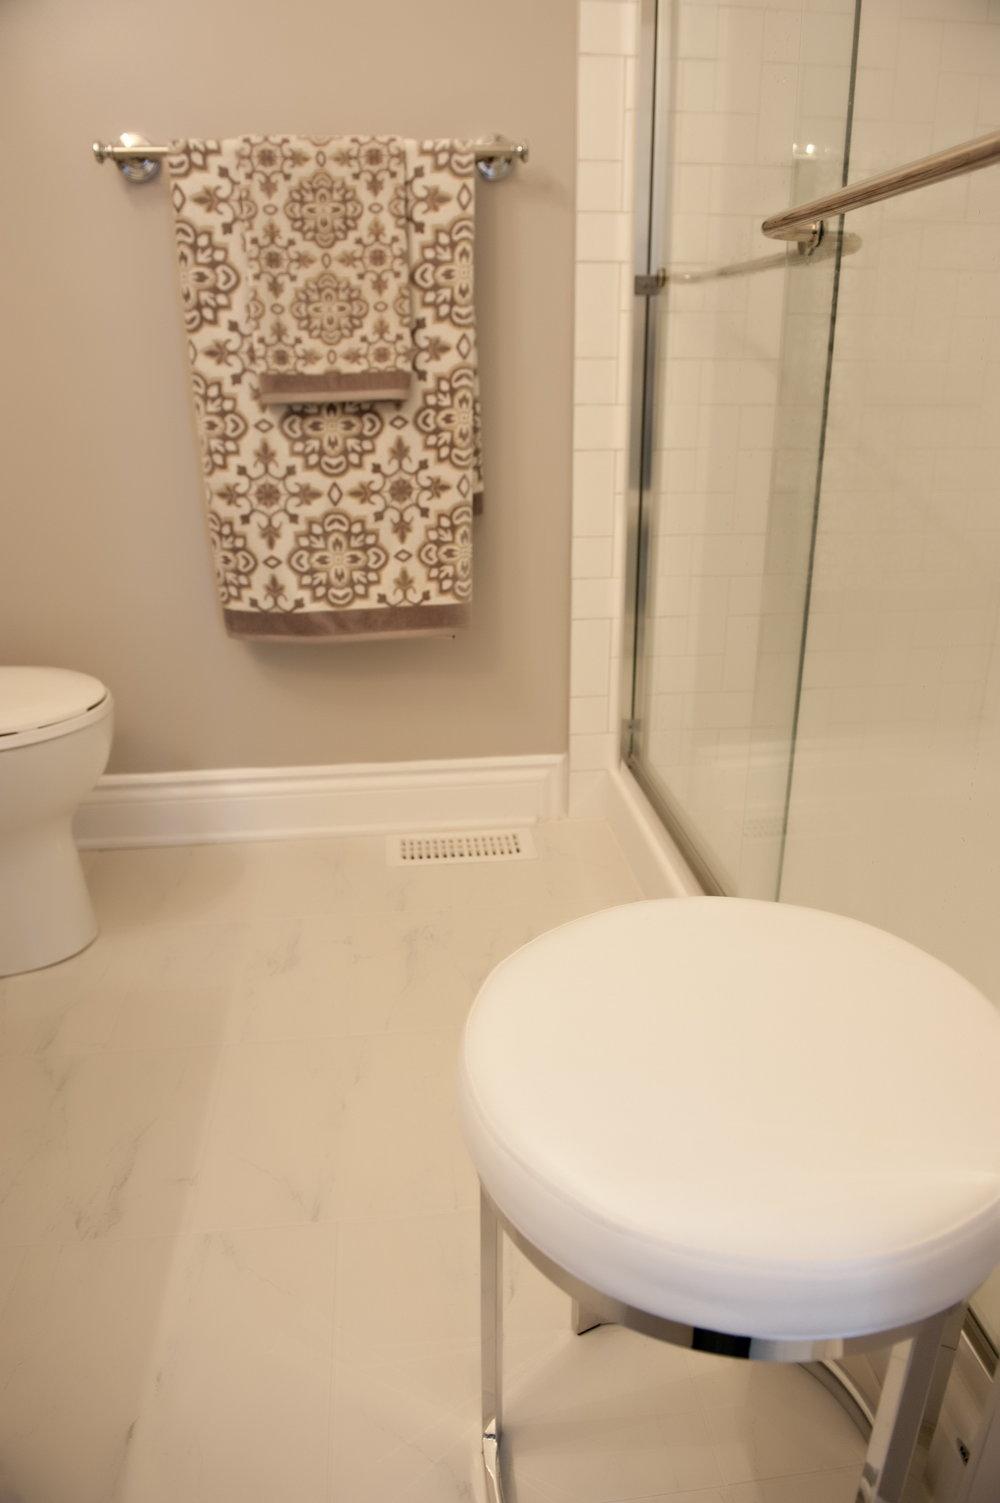 Interior-Design-Bathroom-Shower-Towels-Stool